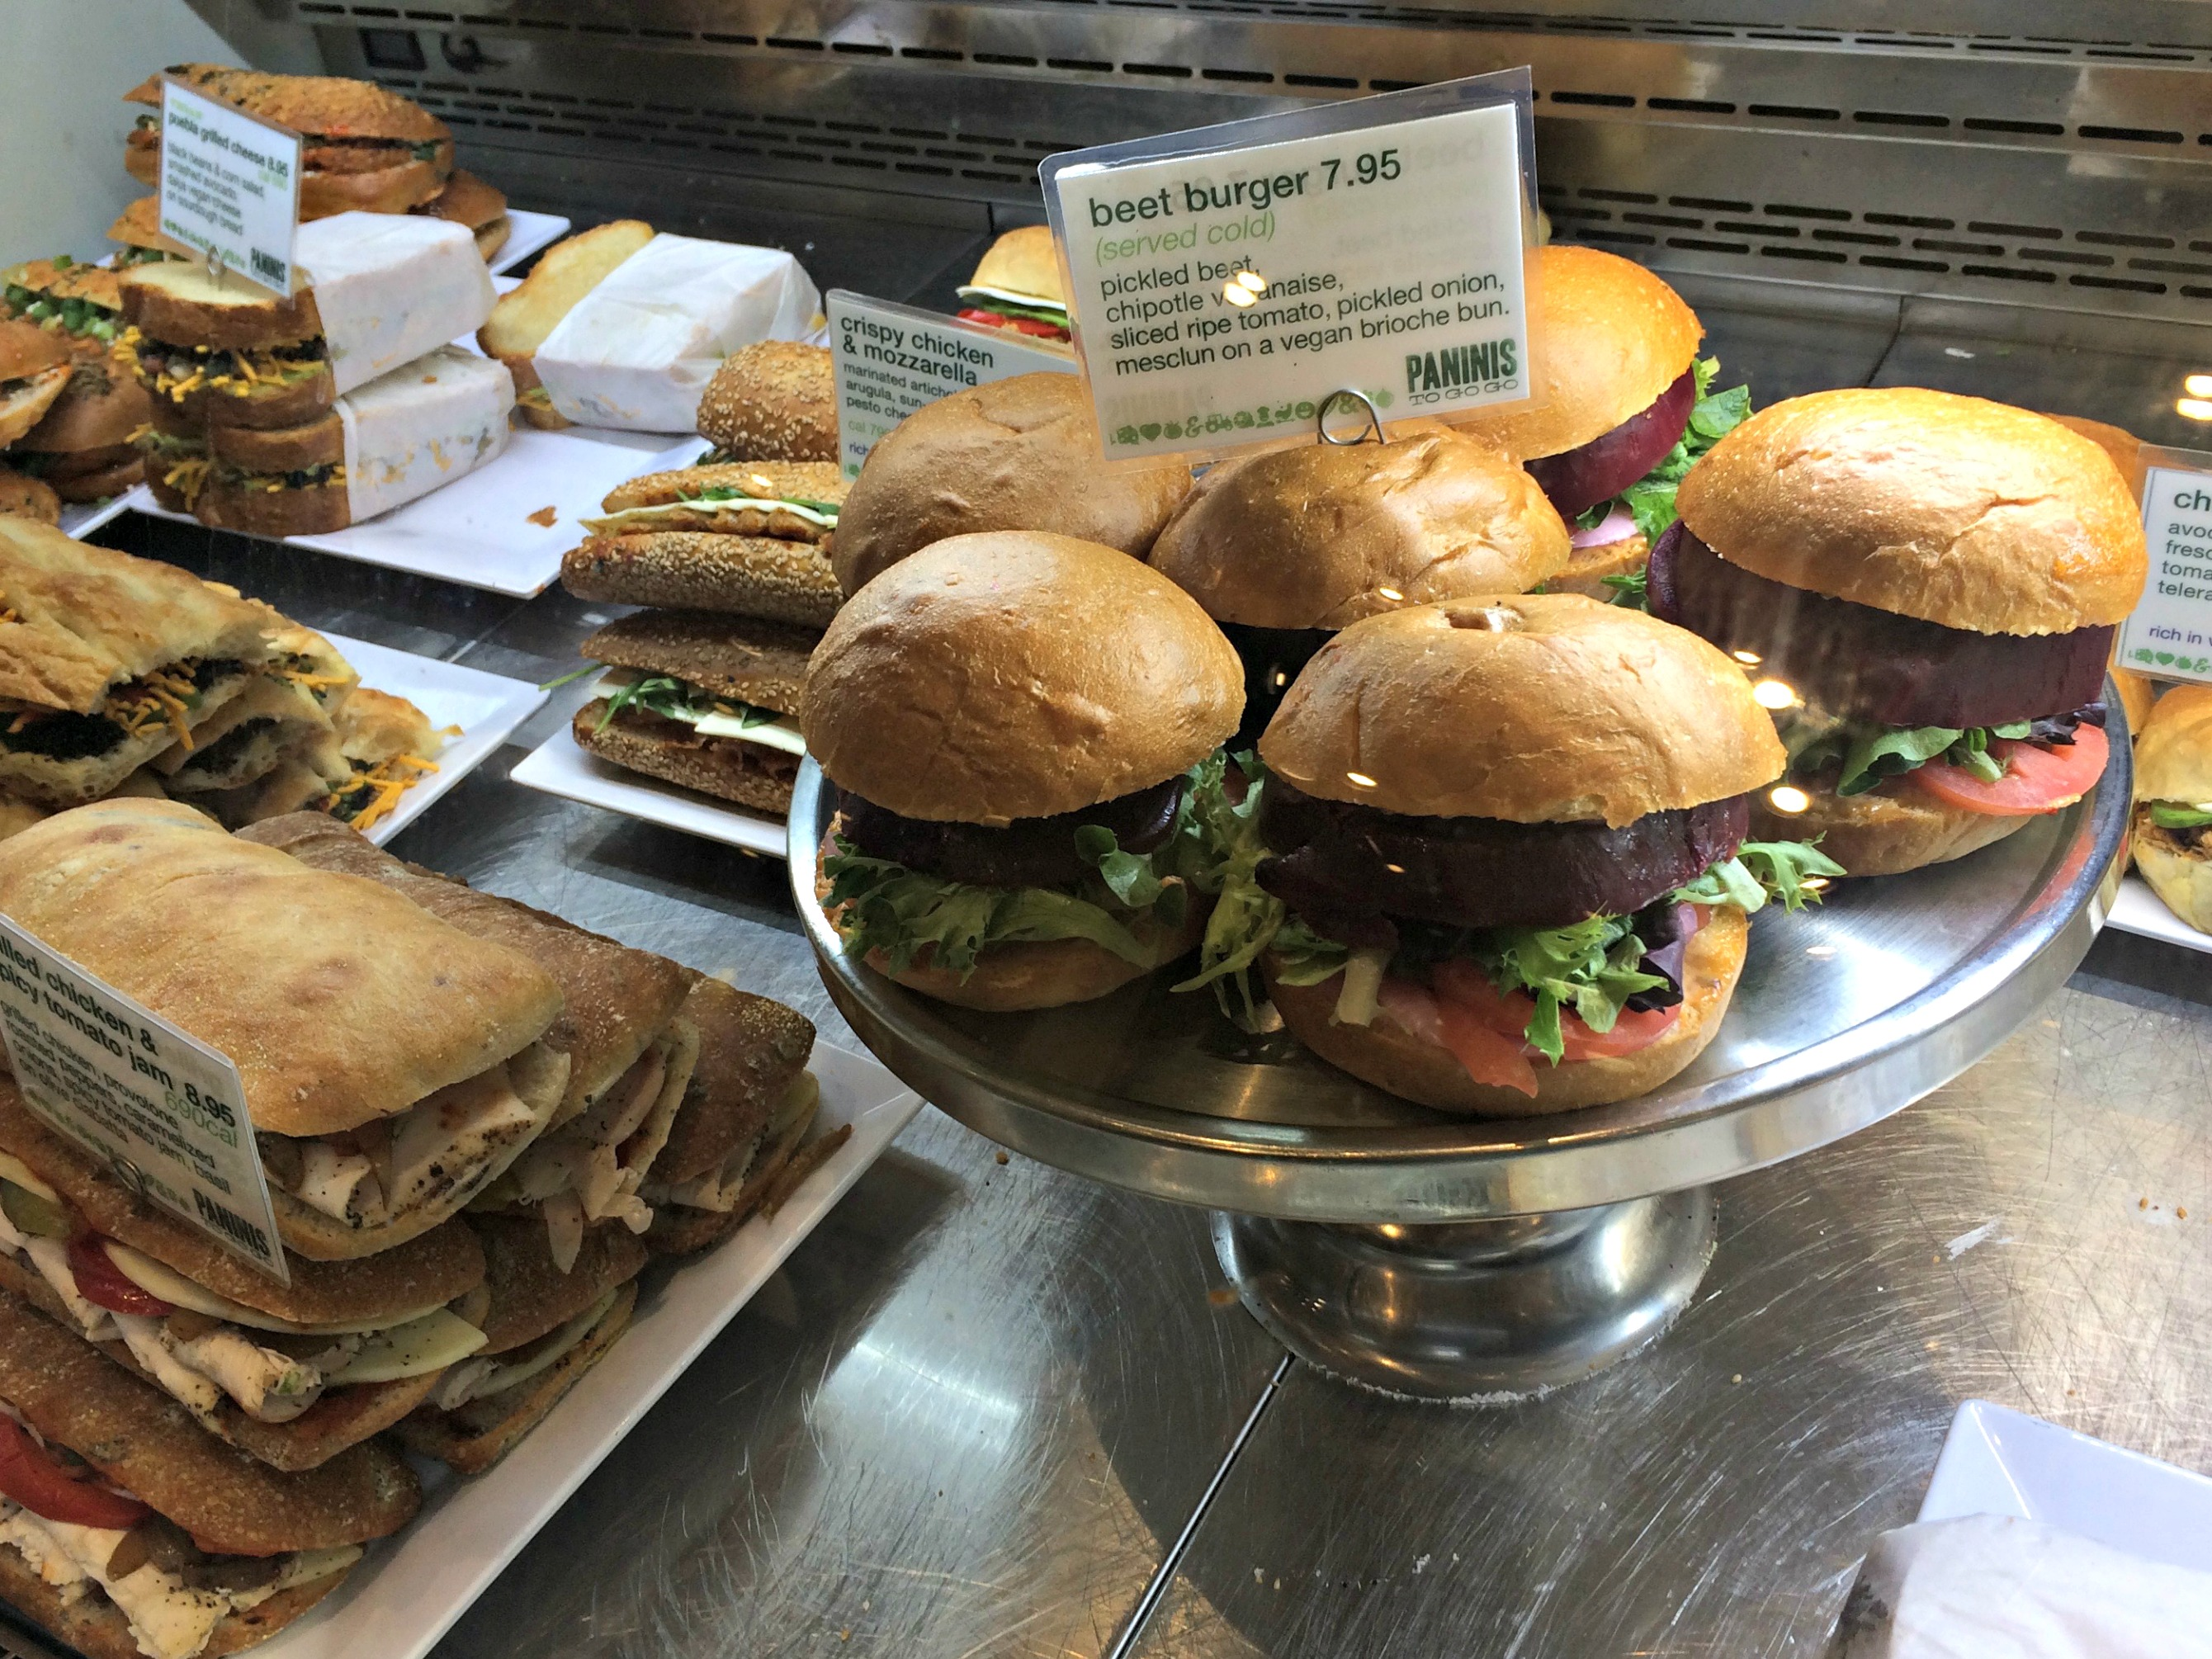 Fresh&Co beet burgers